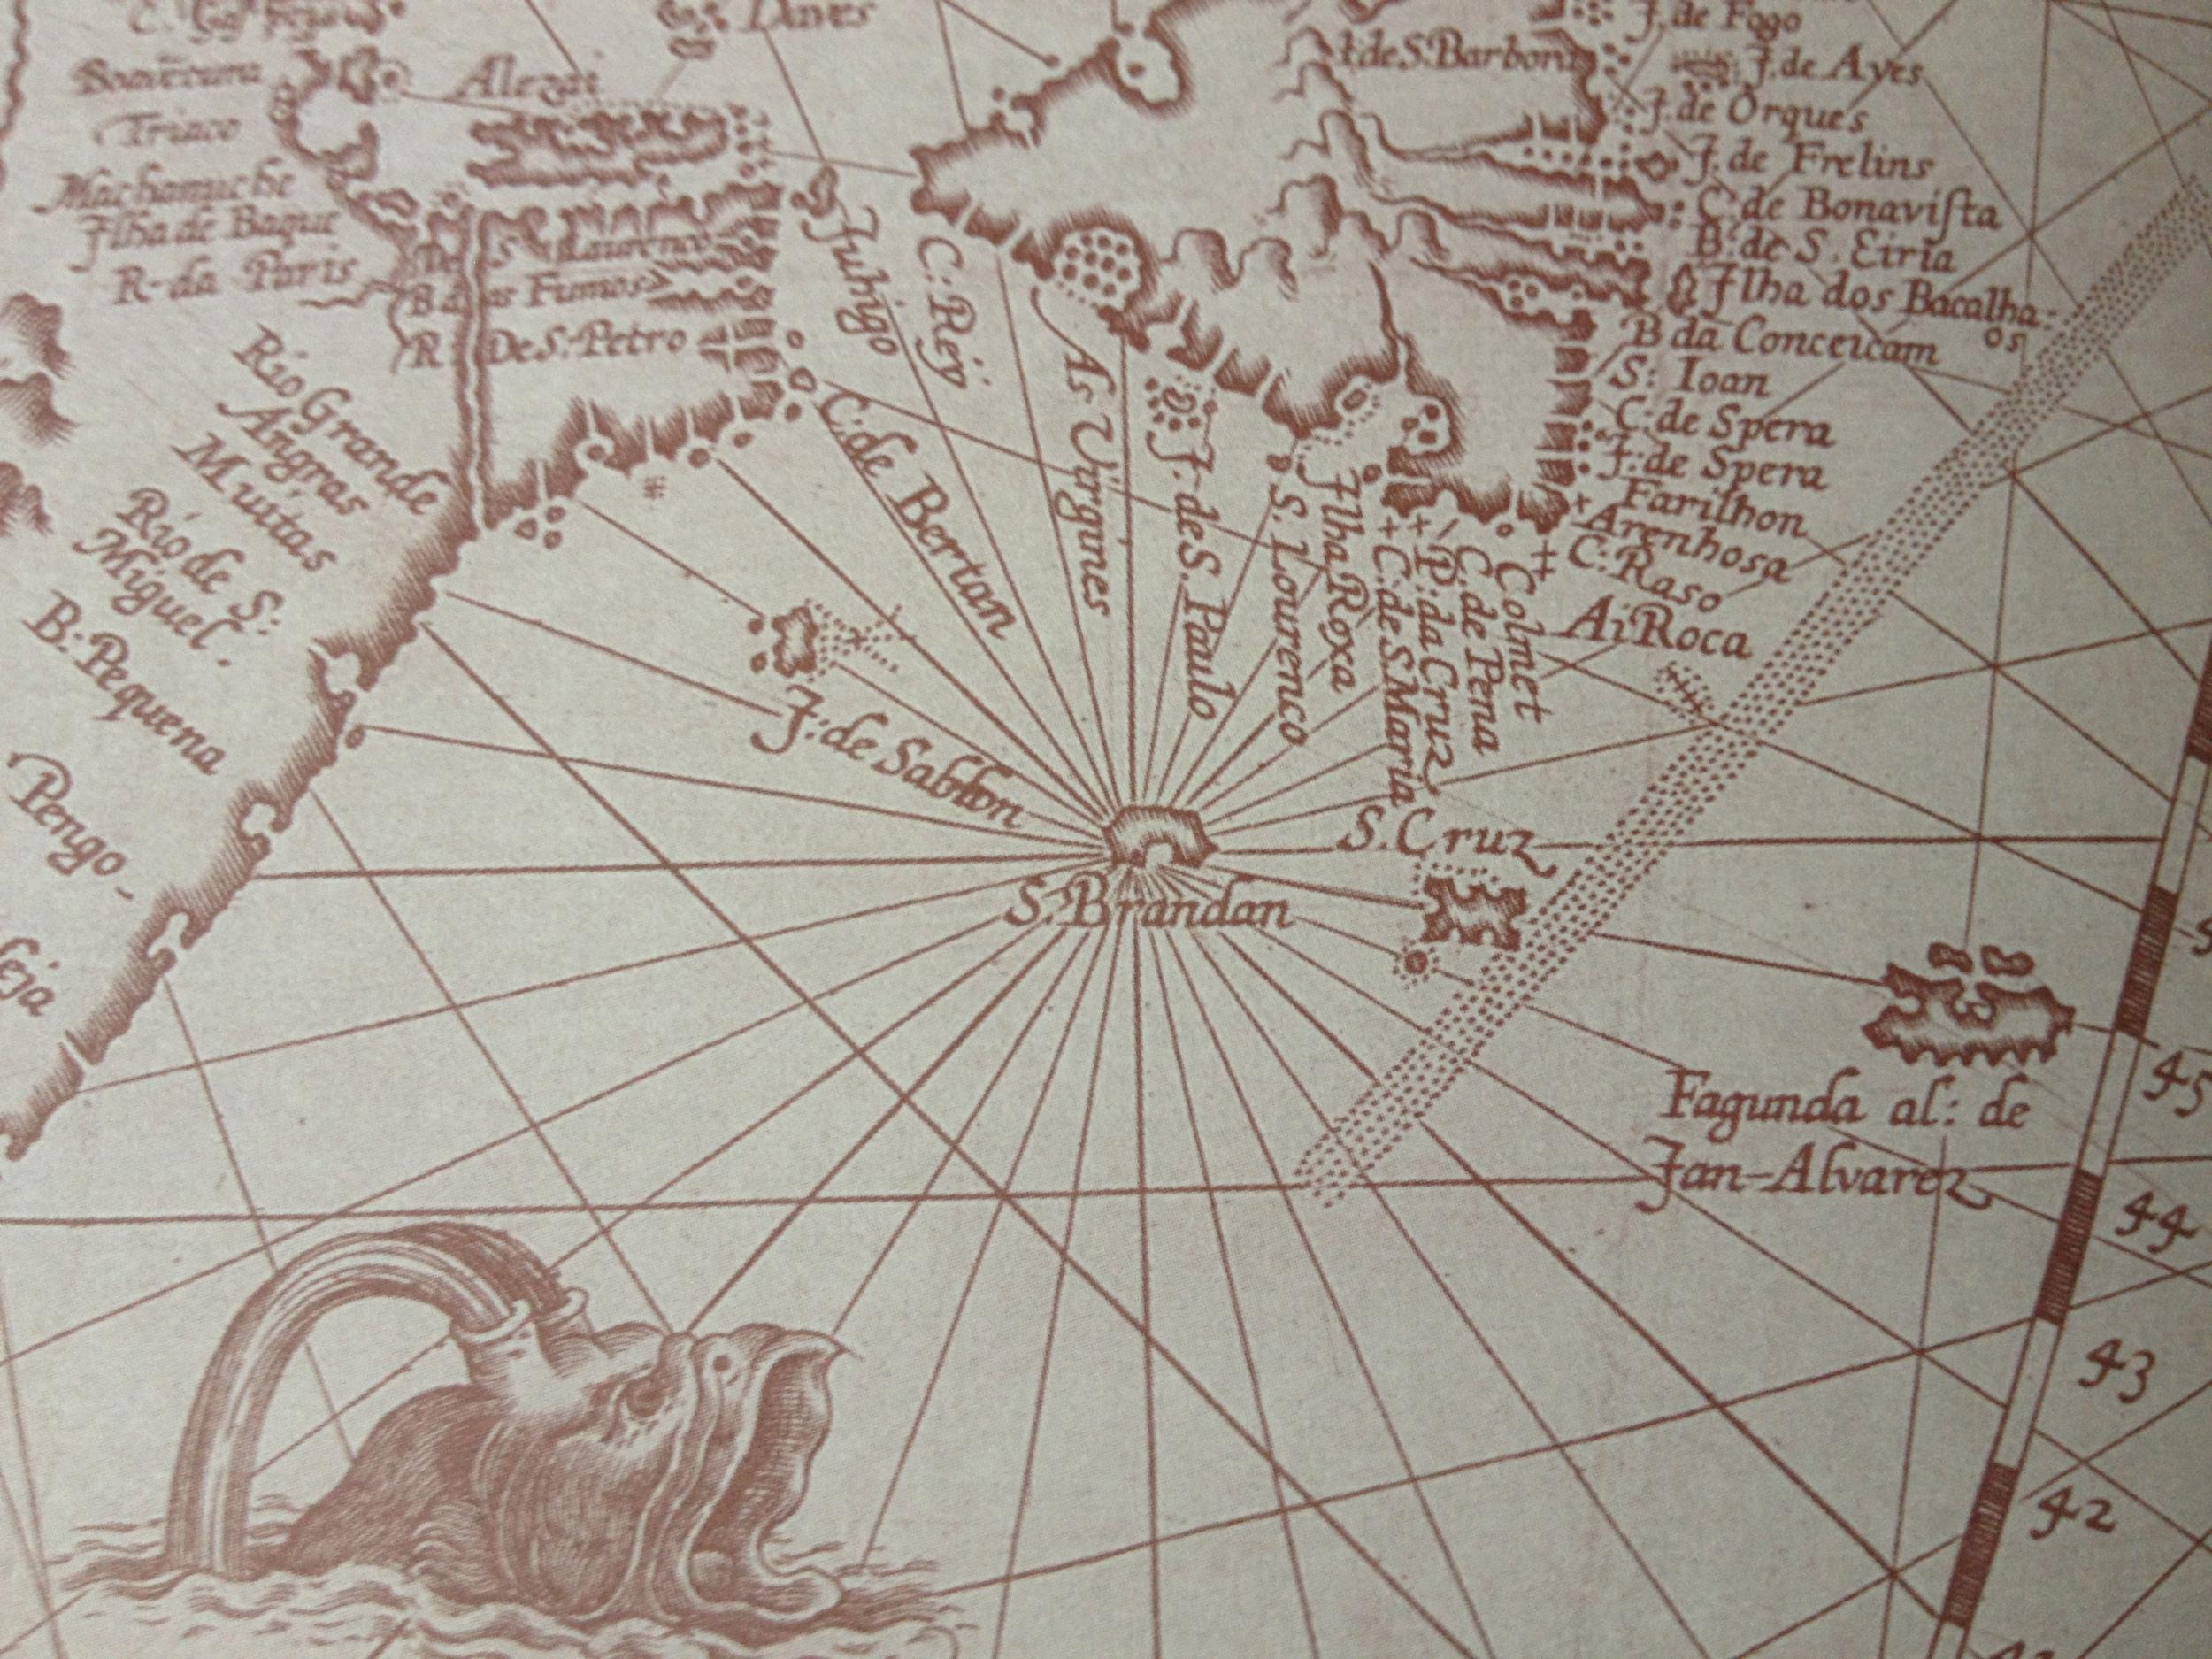 The North Atlantic, c. 1594 by Jan van Doetecum, depicting Saint Brendan's Isle as well asmany other phantom islands such as Buss Island, Brasil, and Frisland.